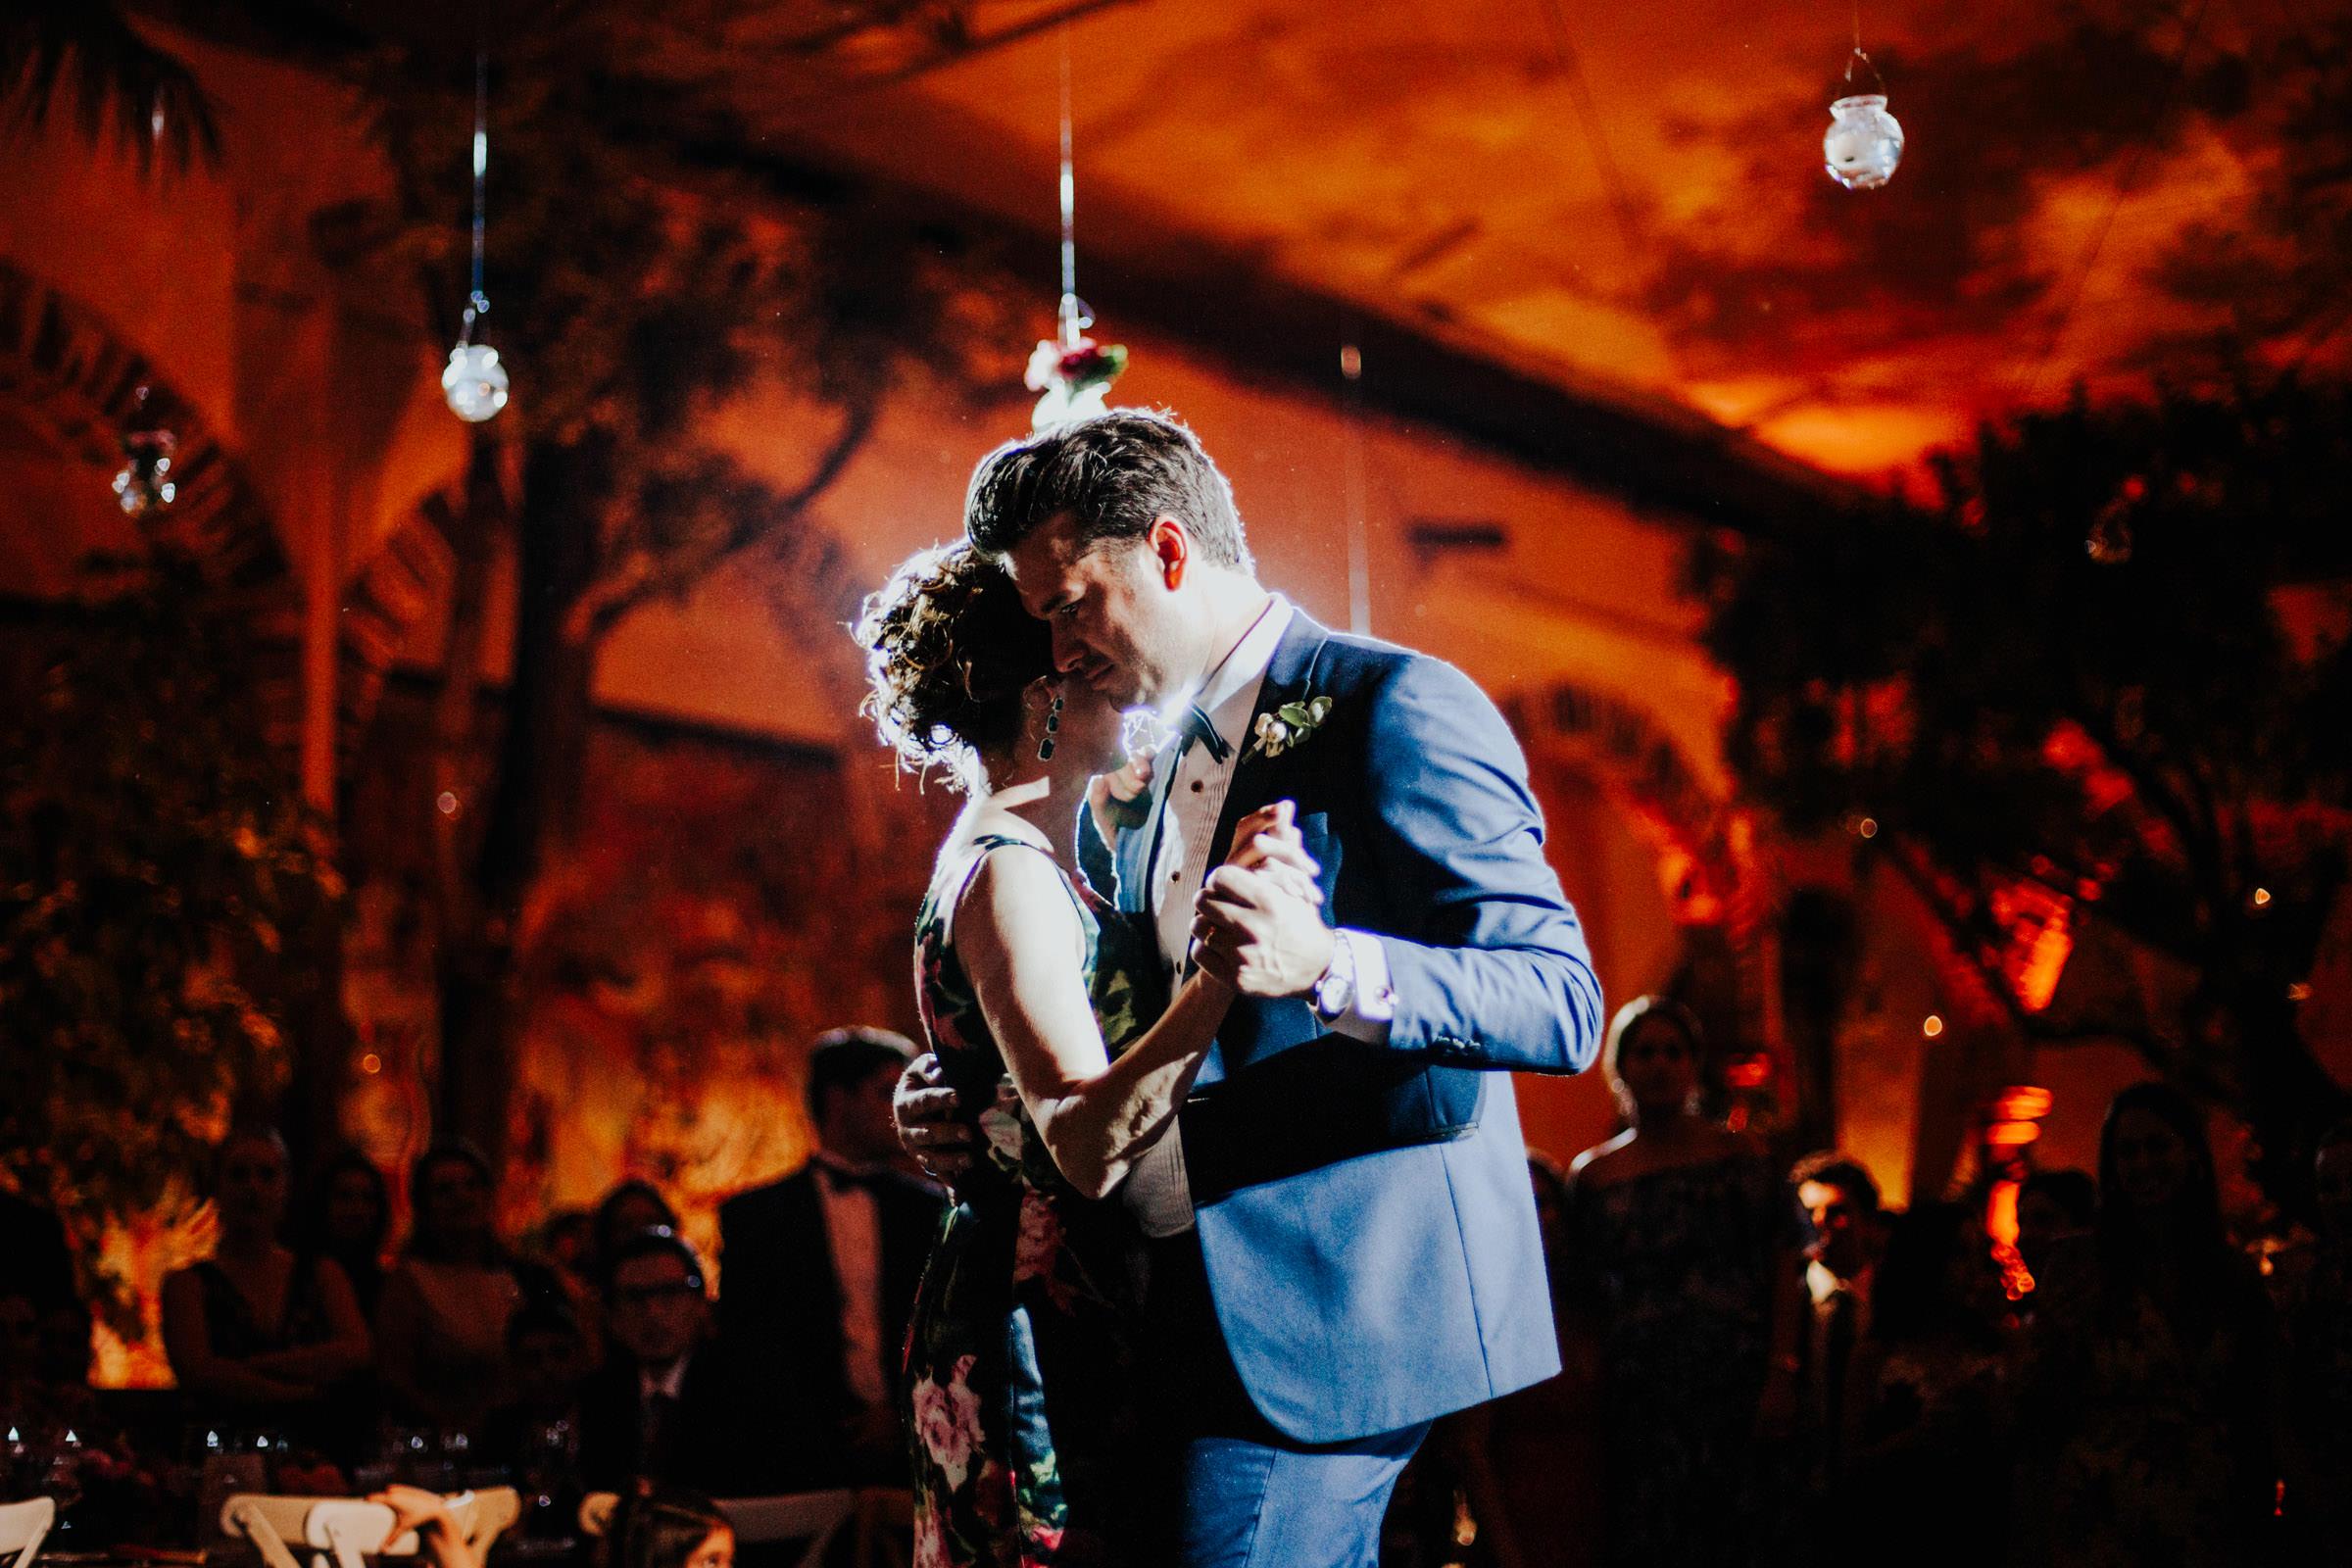 San-Miguel-de-Allende-Wedding-Photography-Parroquia-Instituto-Boda-Fotografia-Fer-Sergio-Pierce-Lifestyle-Photography0031.JPG